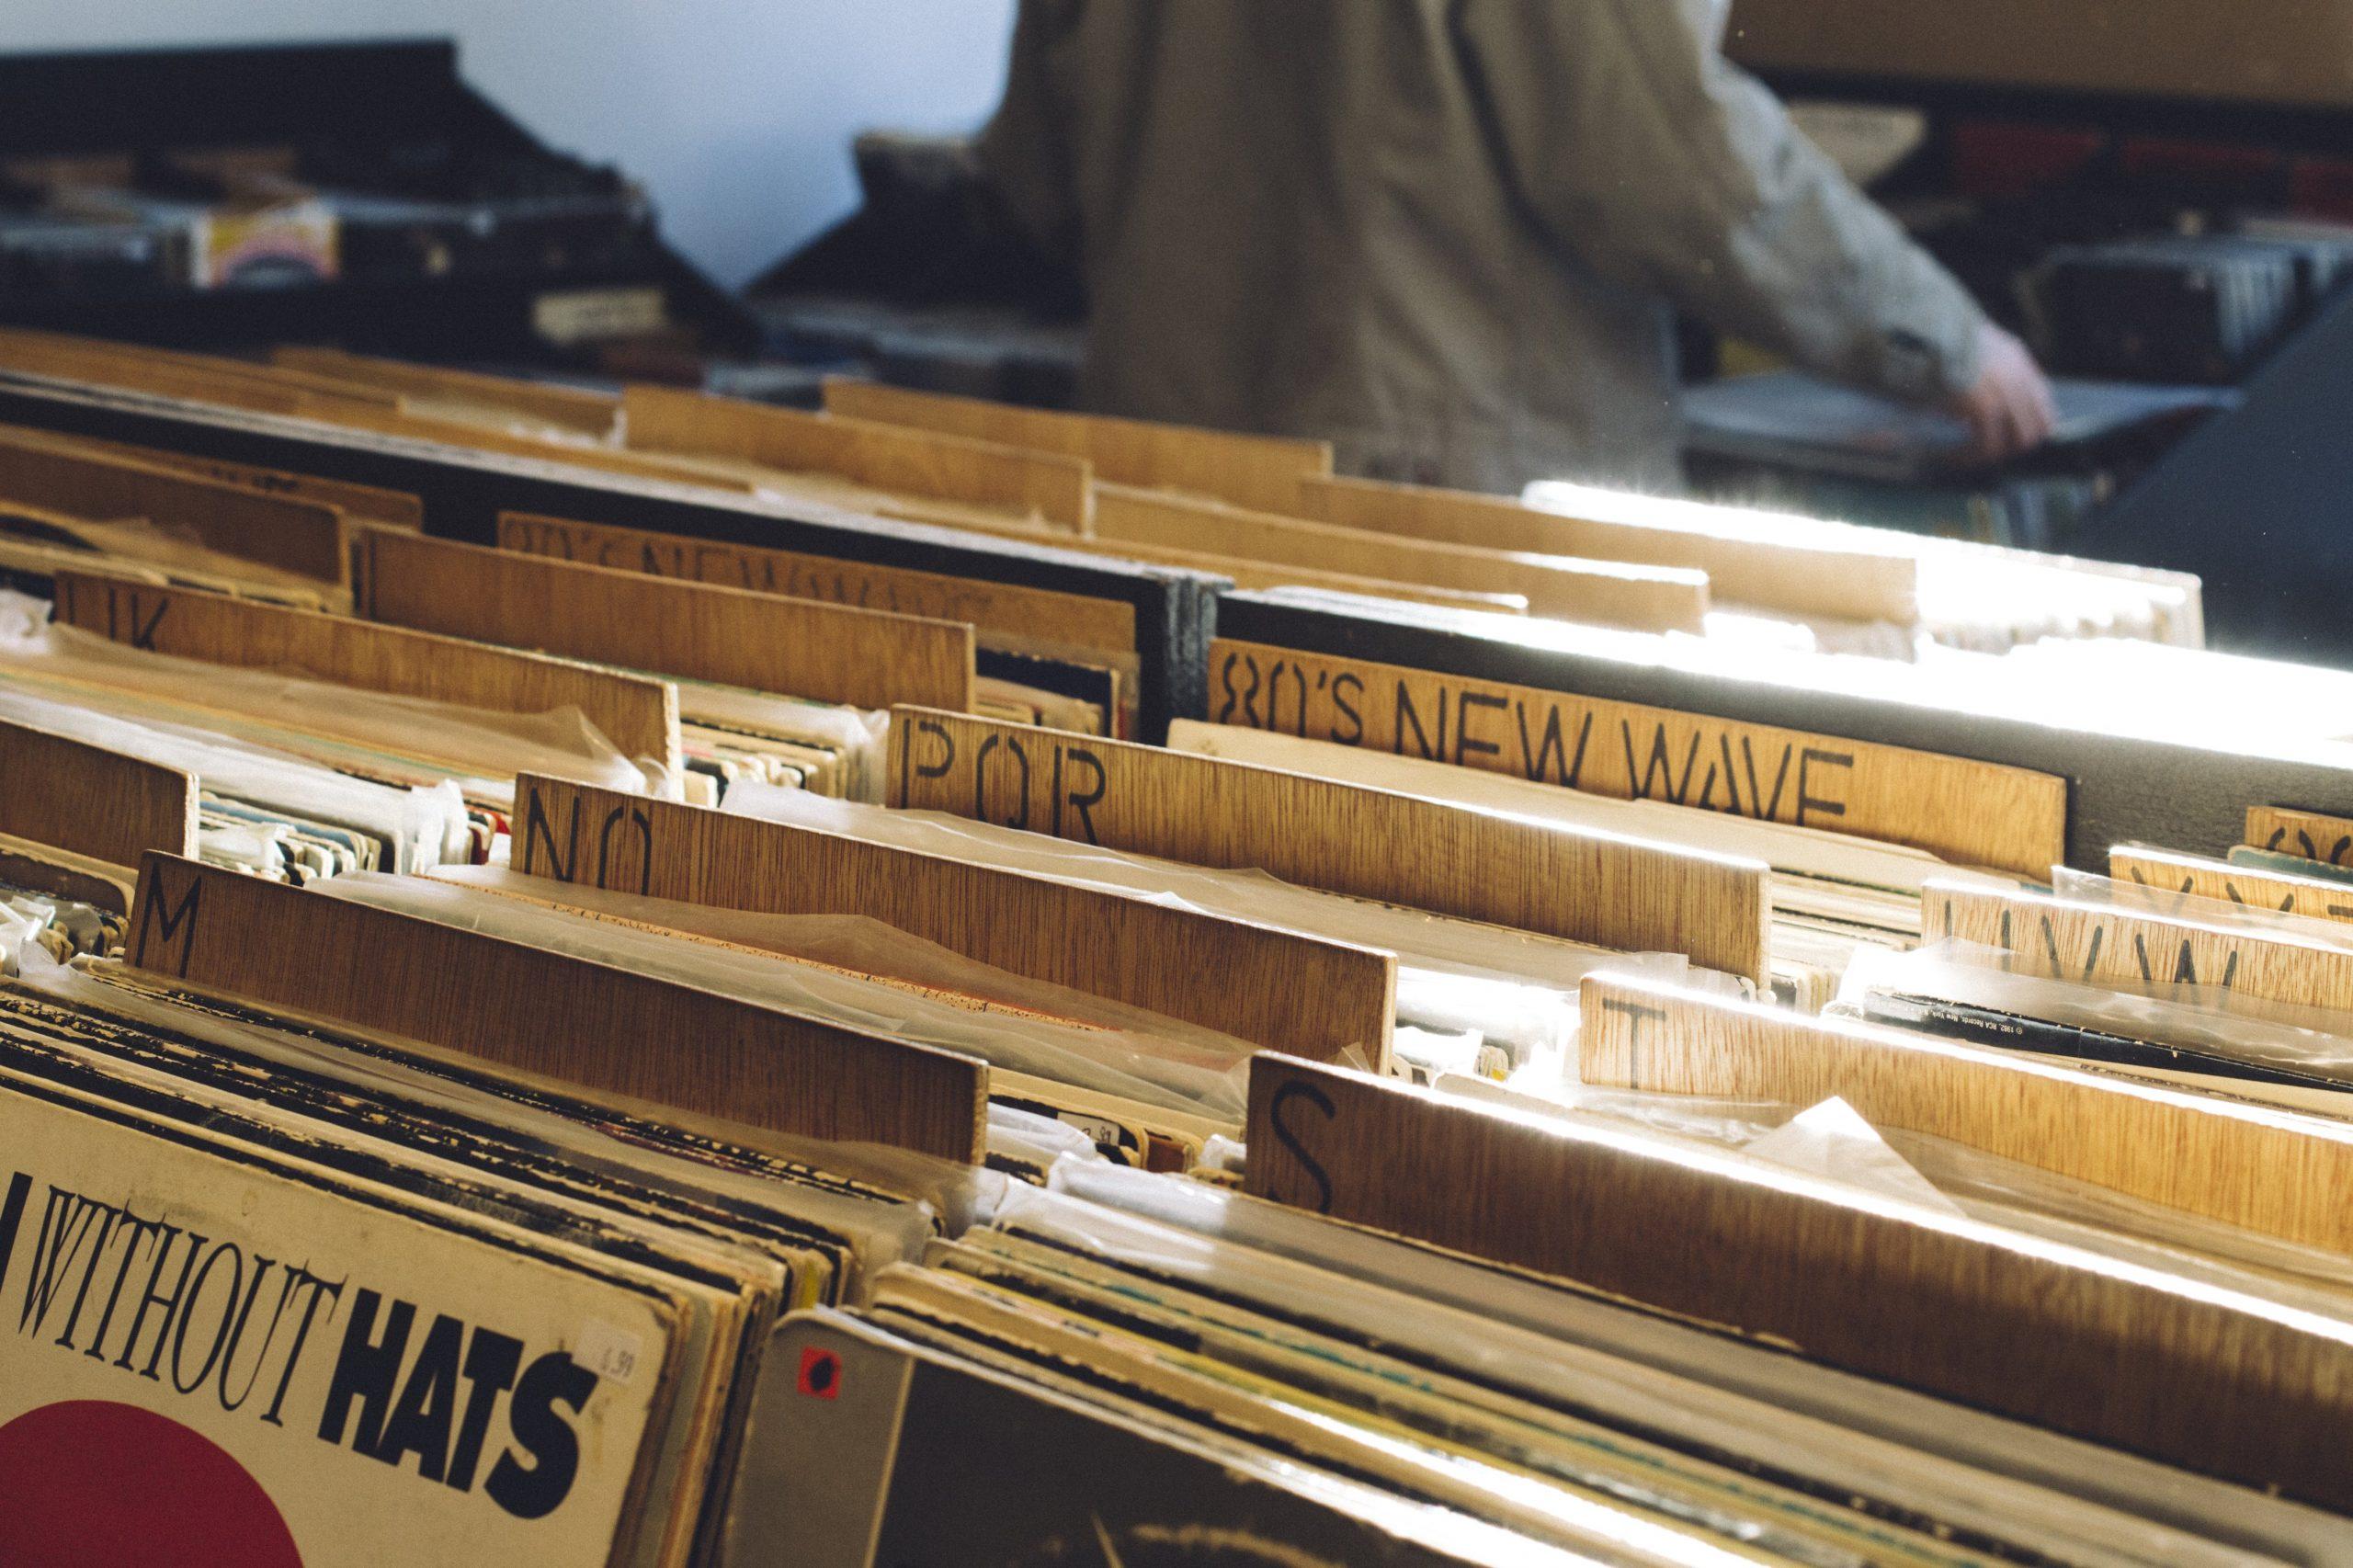 light shining on vinyl records scaled